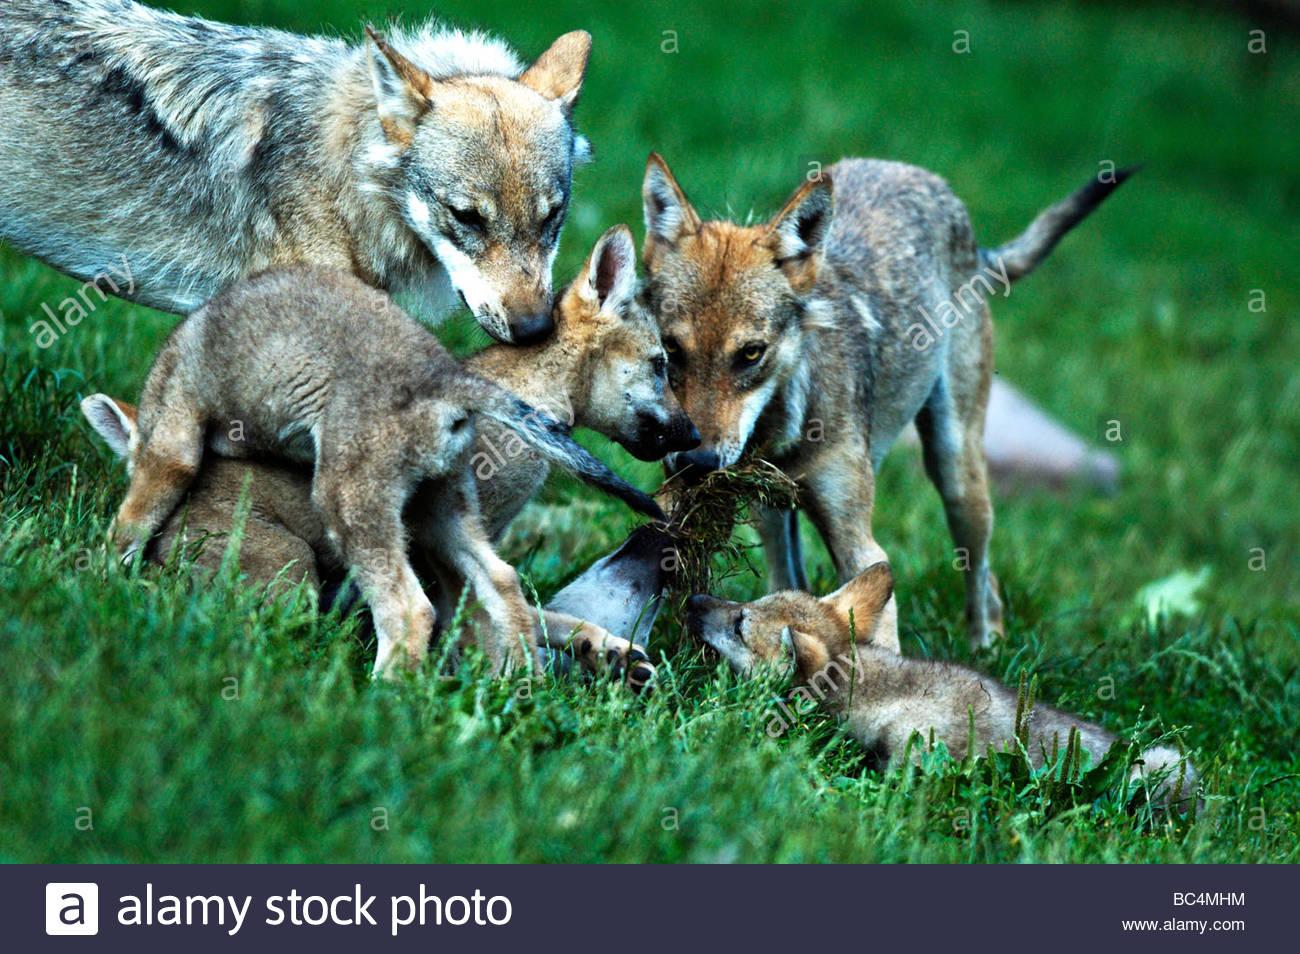 Mackenzie valley wolf - photo#48